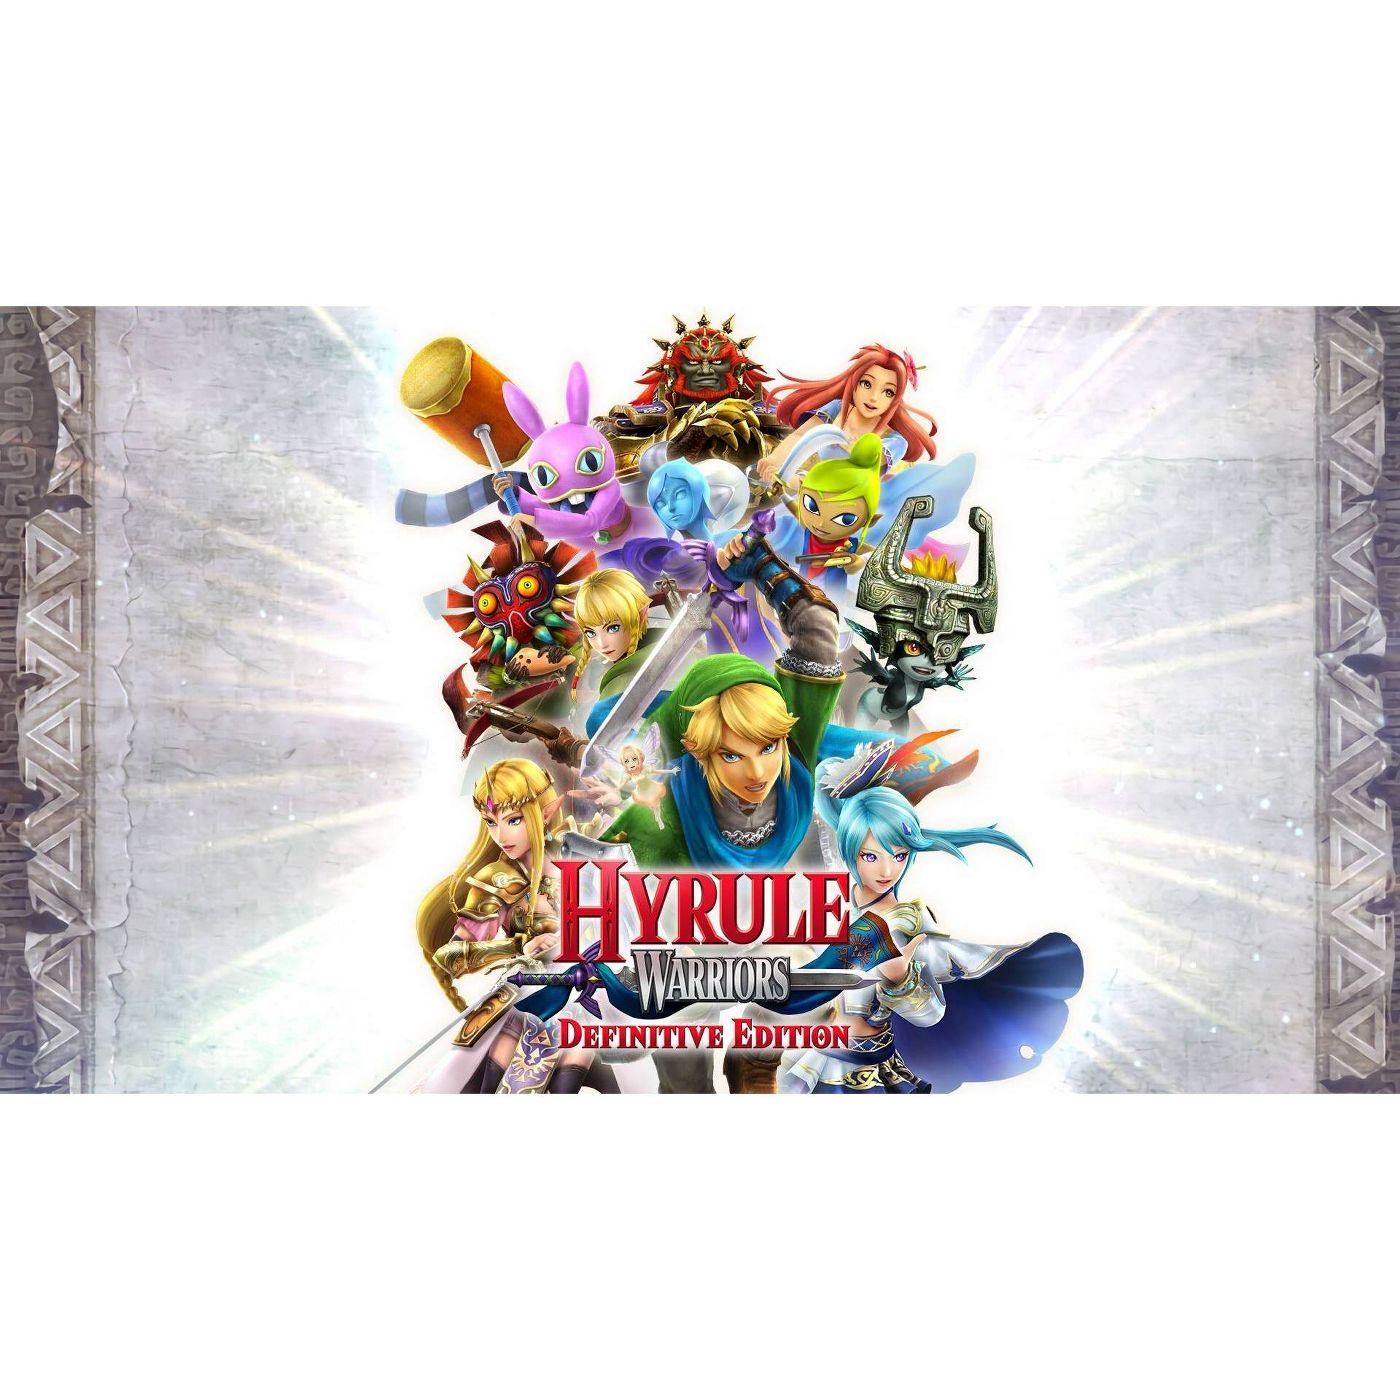 Hyrule Warriors: Definitive Edition - Nintendo Switch (Digital) $50